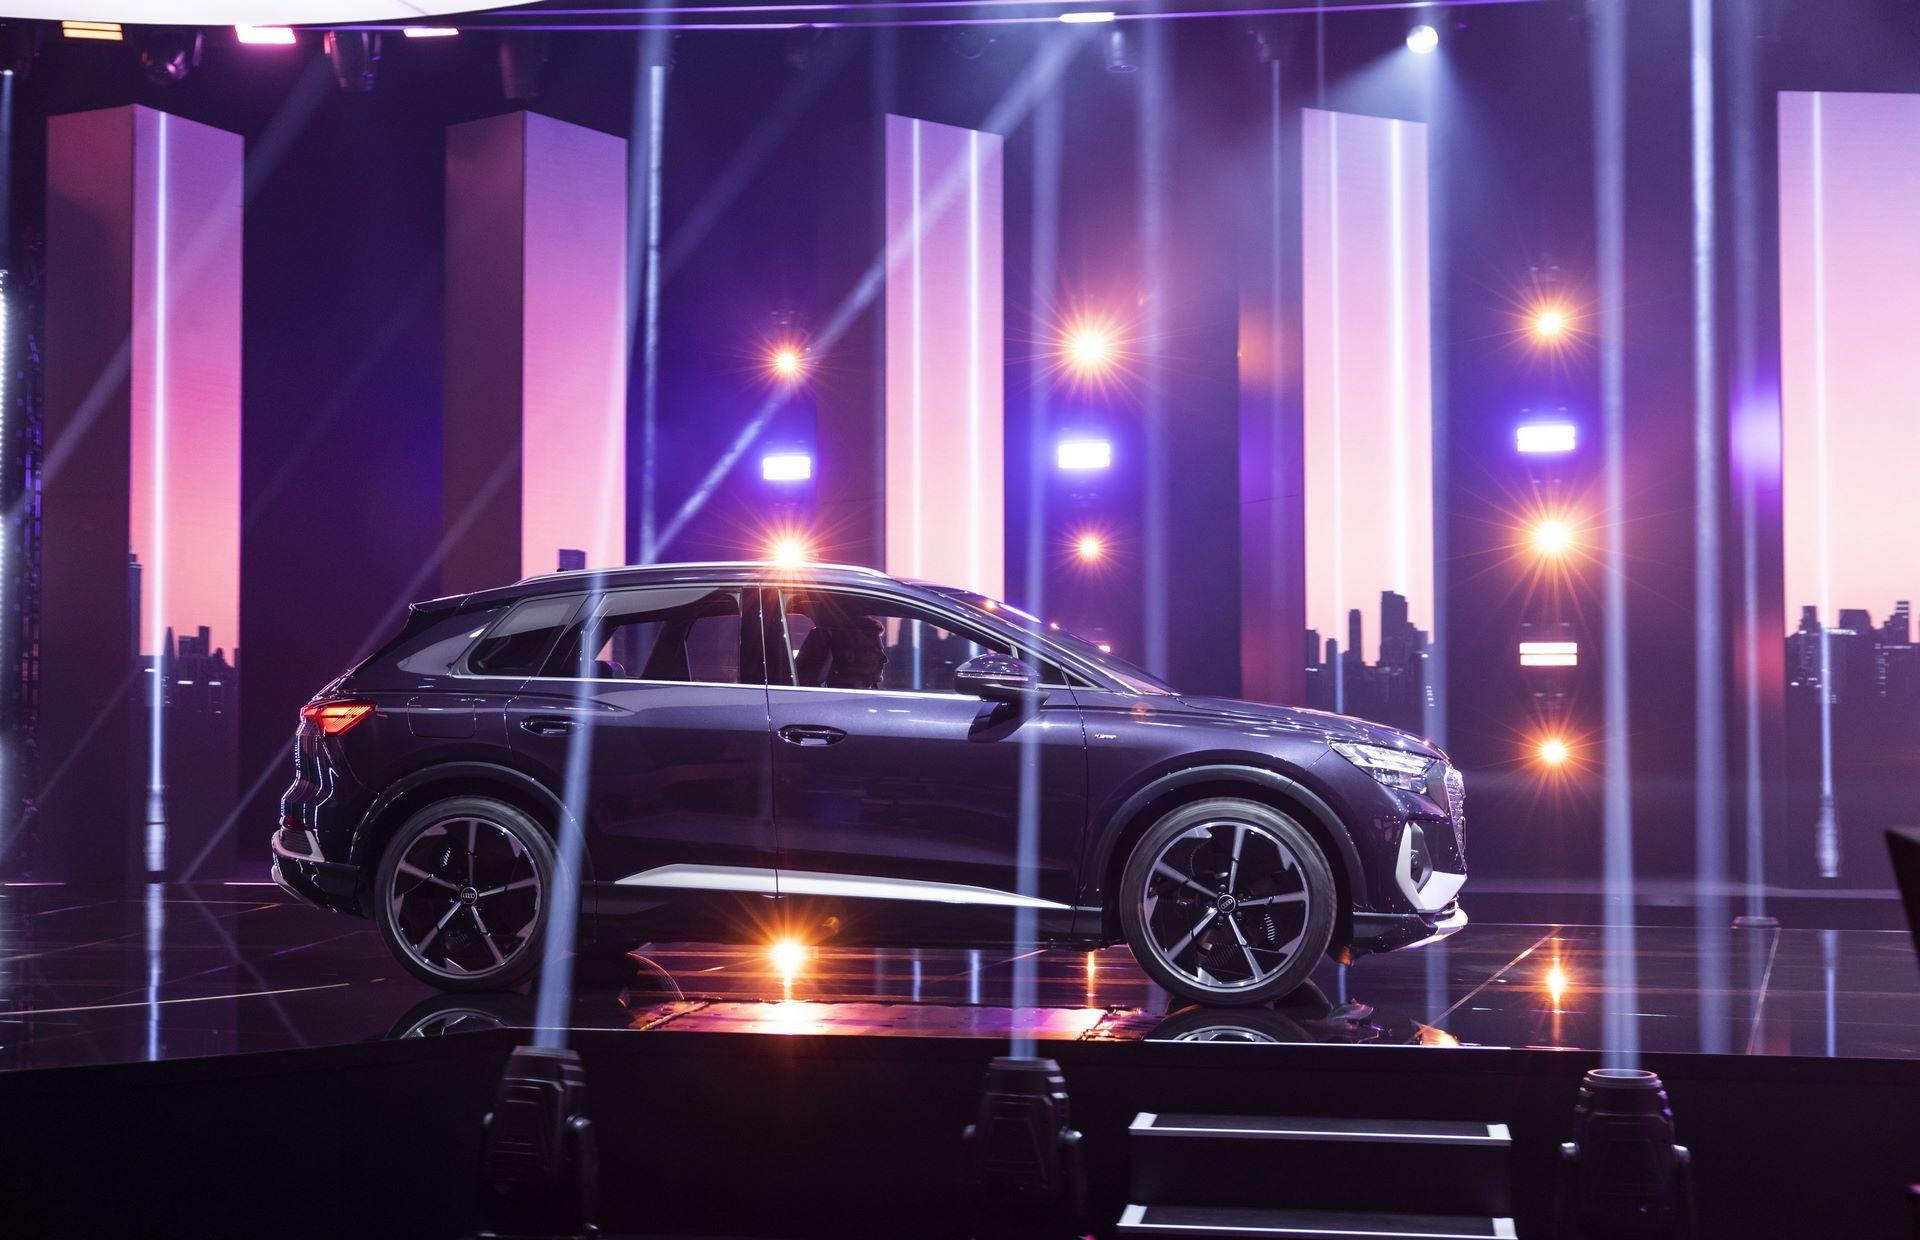 Audi-Q4-e-tron-and-Q4-e-tron-Sportback-15